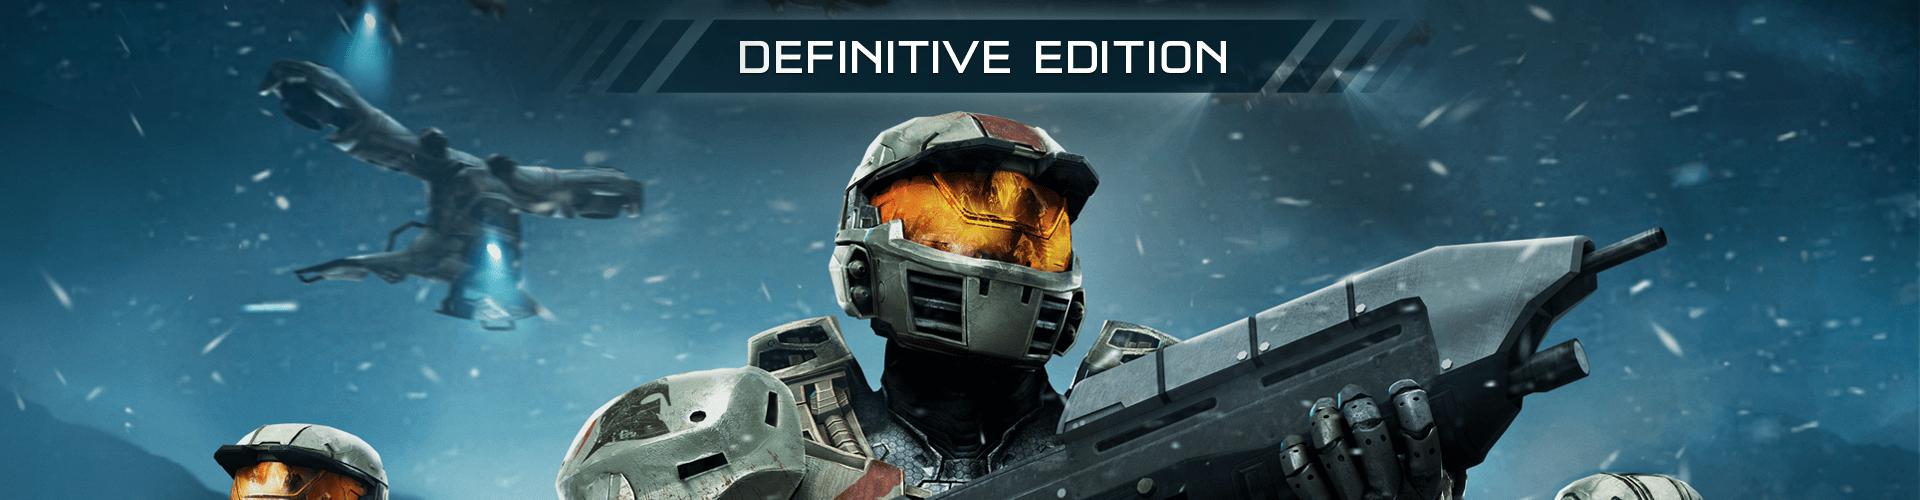 Halo Wars Definitive Edition Xbox One